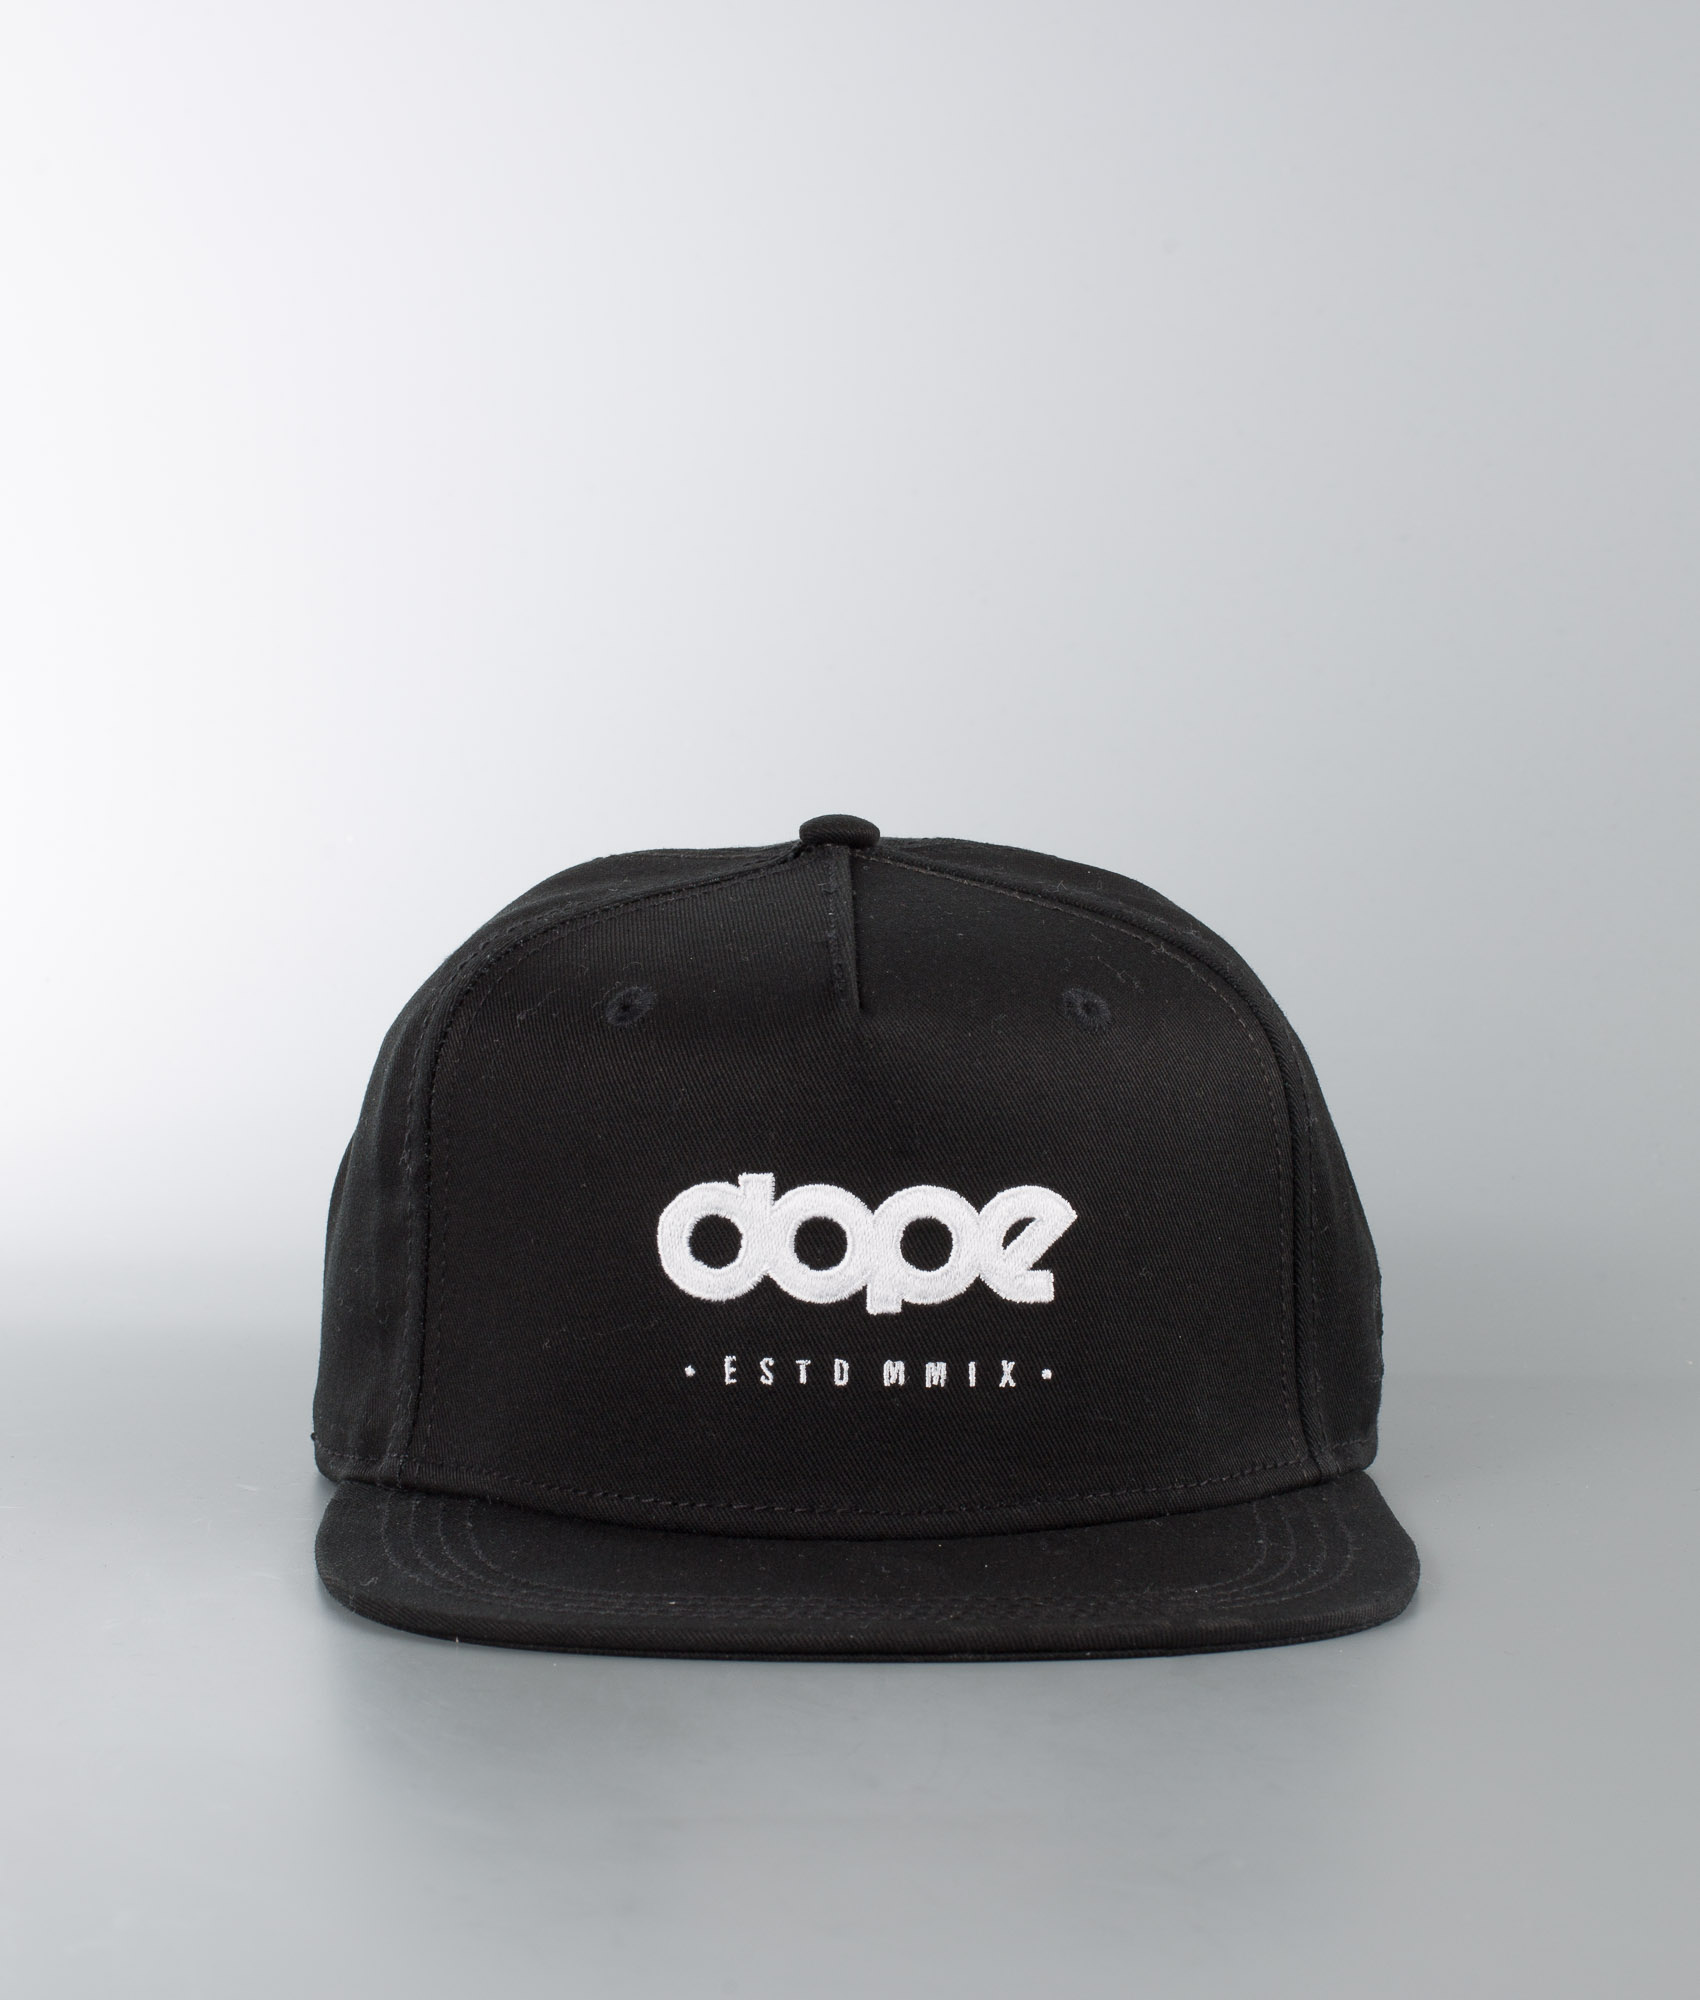 official photos 94272 3dff5 coupon code for dope og cap black black ridestore 77f11 f9e56